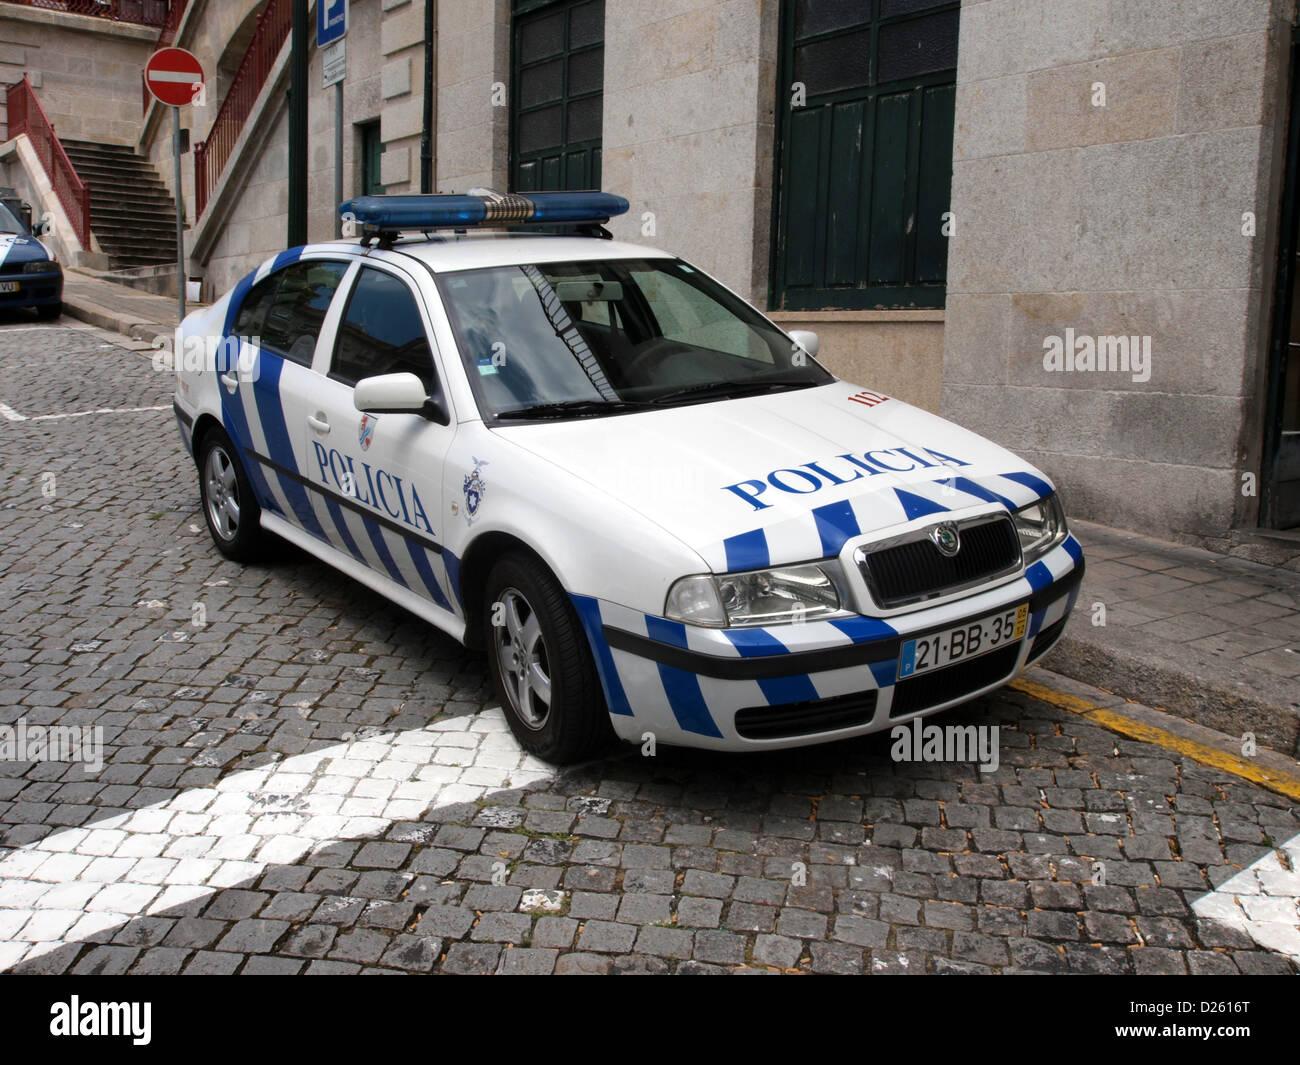 Skoda au service de la police - Page 7 Police-carpolicia-porto-skoda-D2616T